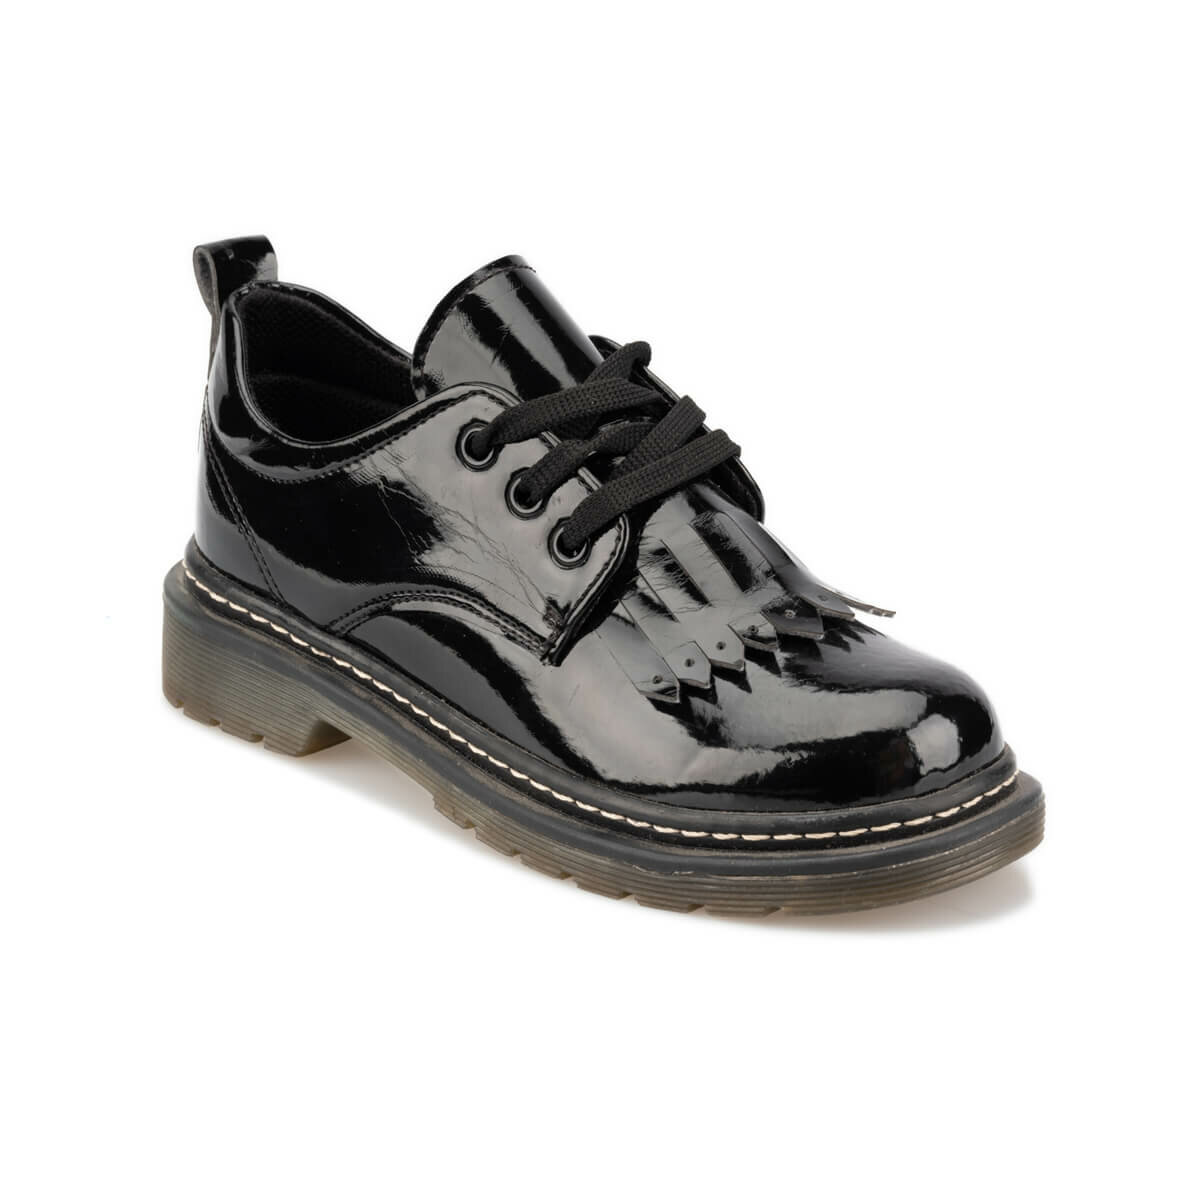 FLO 92. 511903.F Black Female Child Shoes Polaris